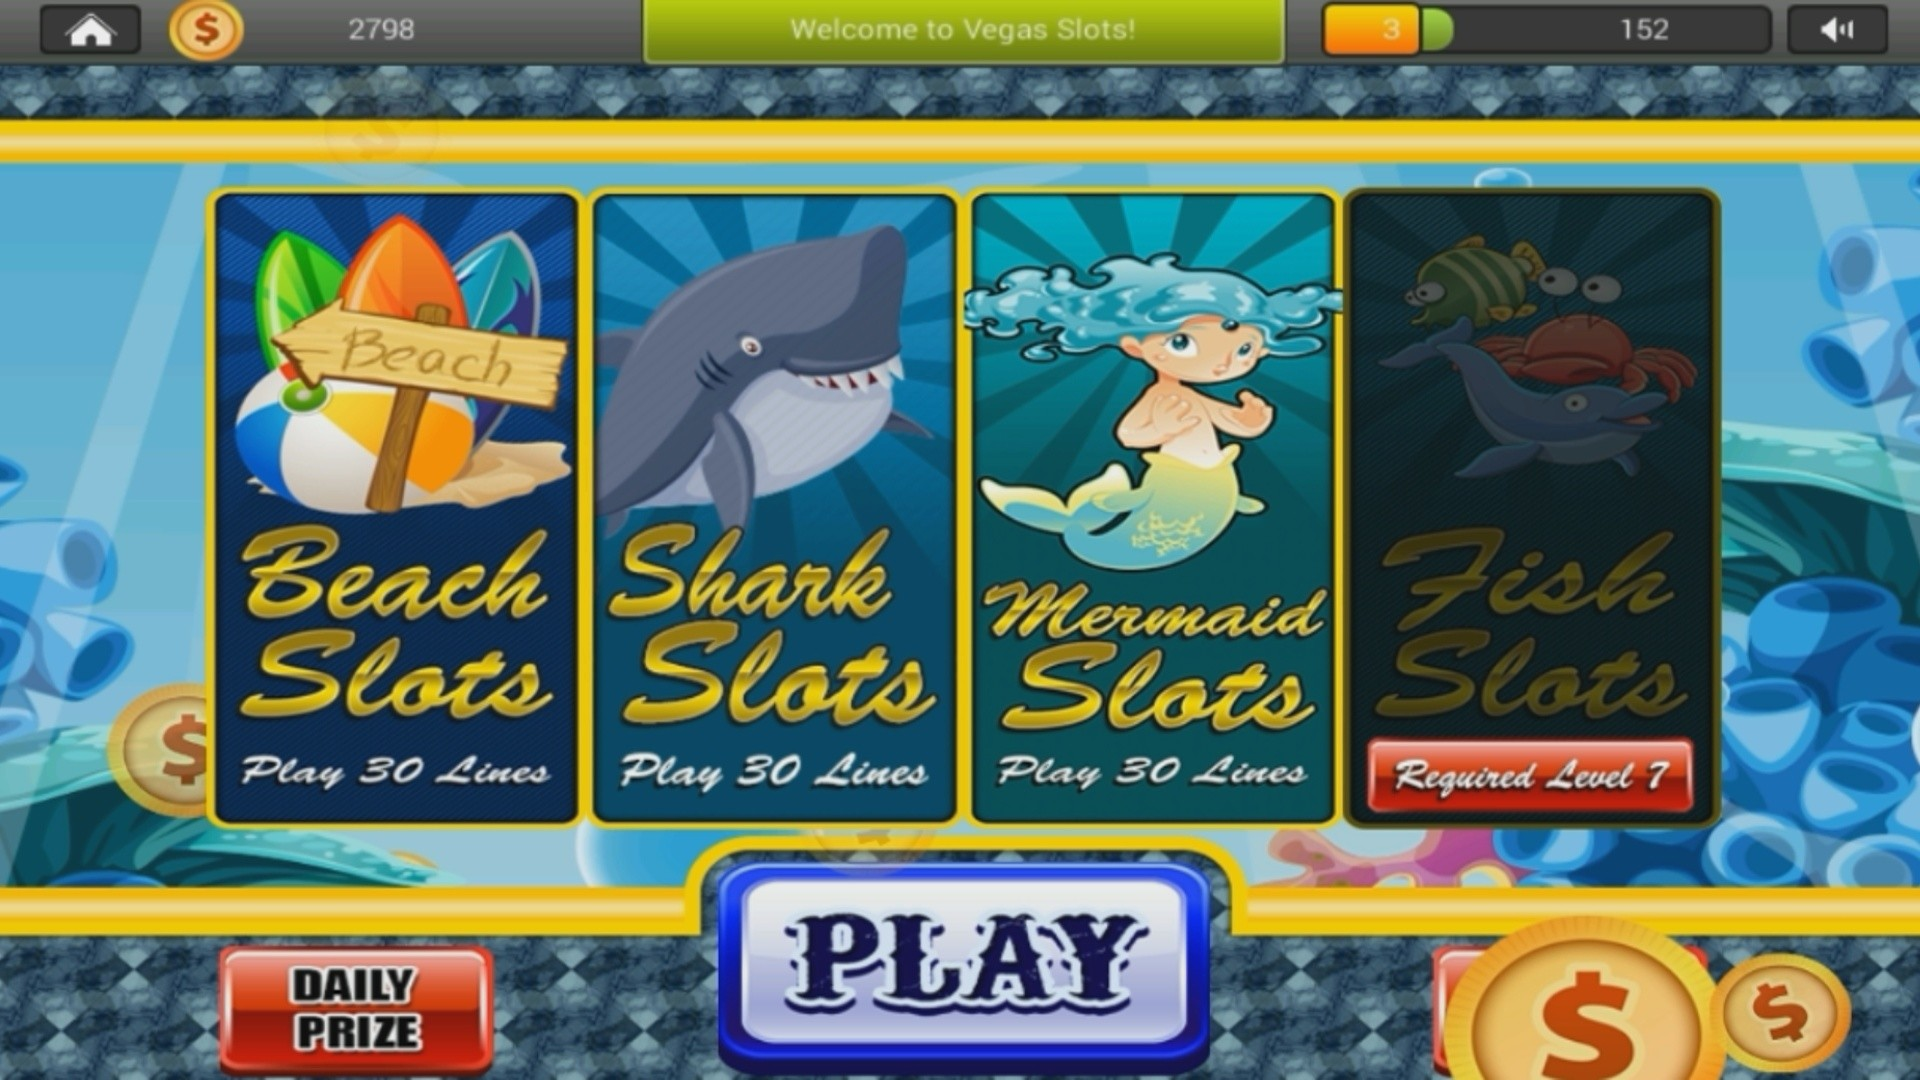 juegos casino slot machine gratis